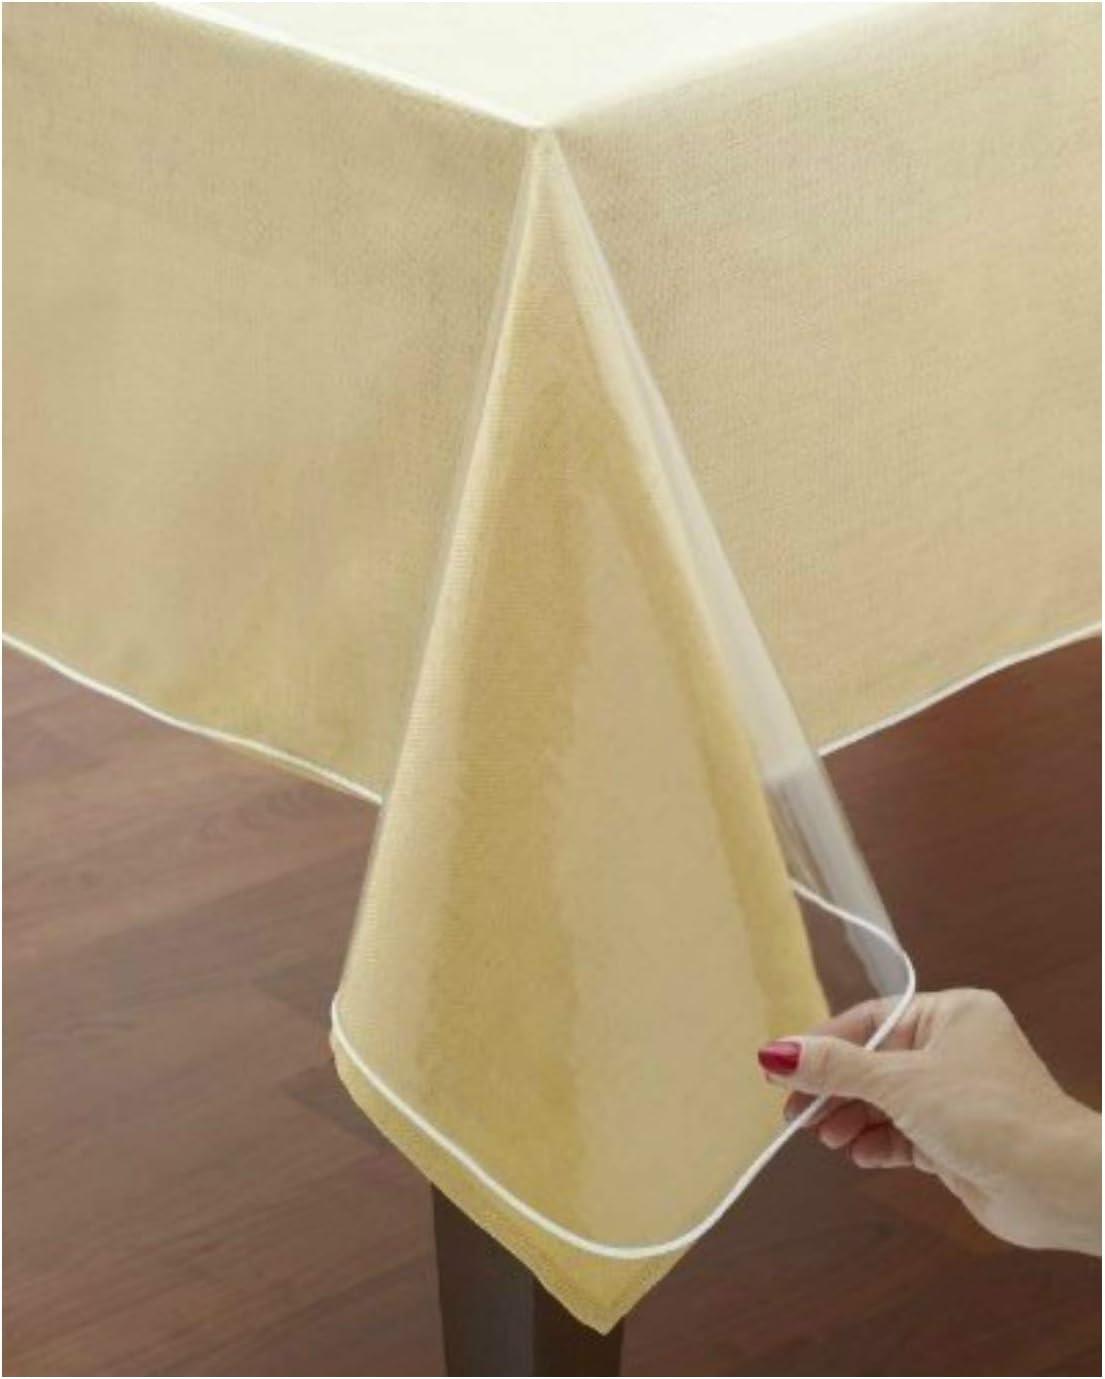 140 x 240 cm VITA PERFETTA Nappe Transparente Rectangle Protection PVC